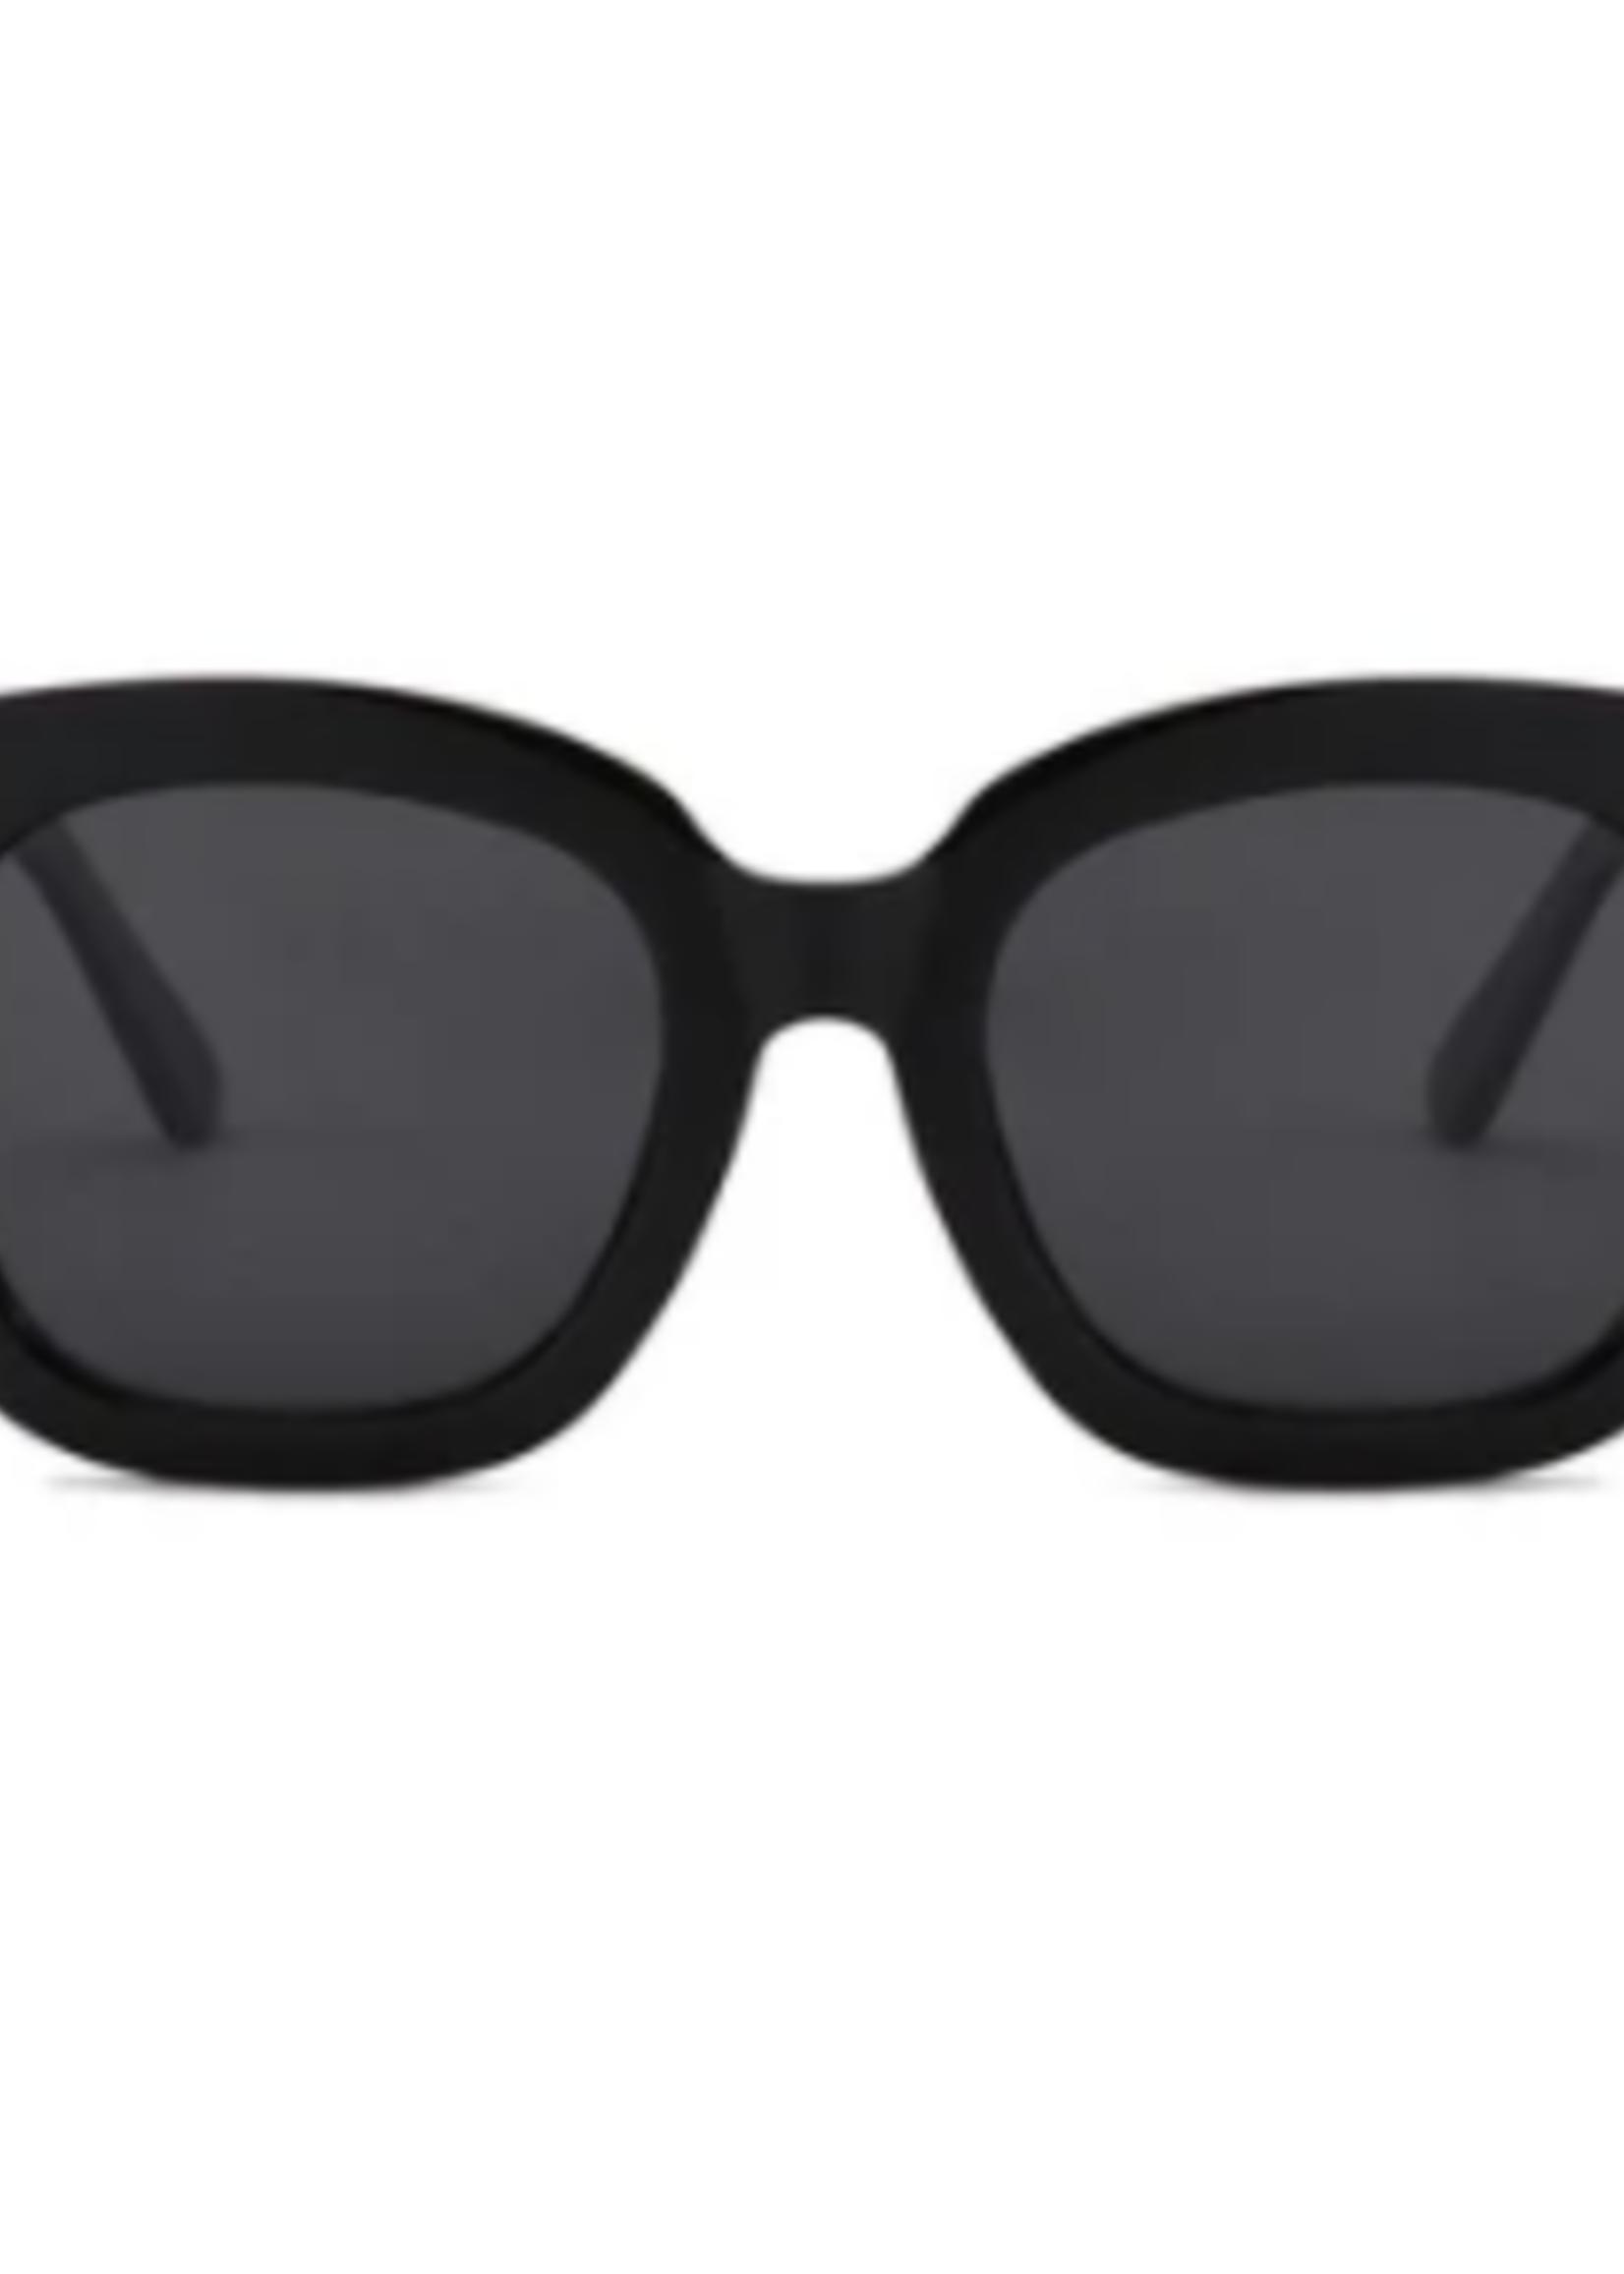 "Shady Lady ""SOPHIE"" Sunglasses"